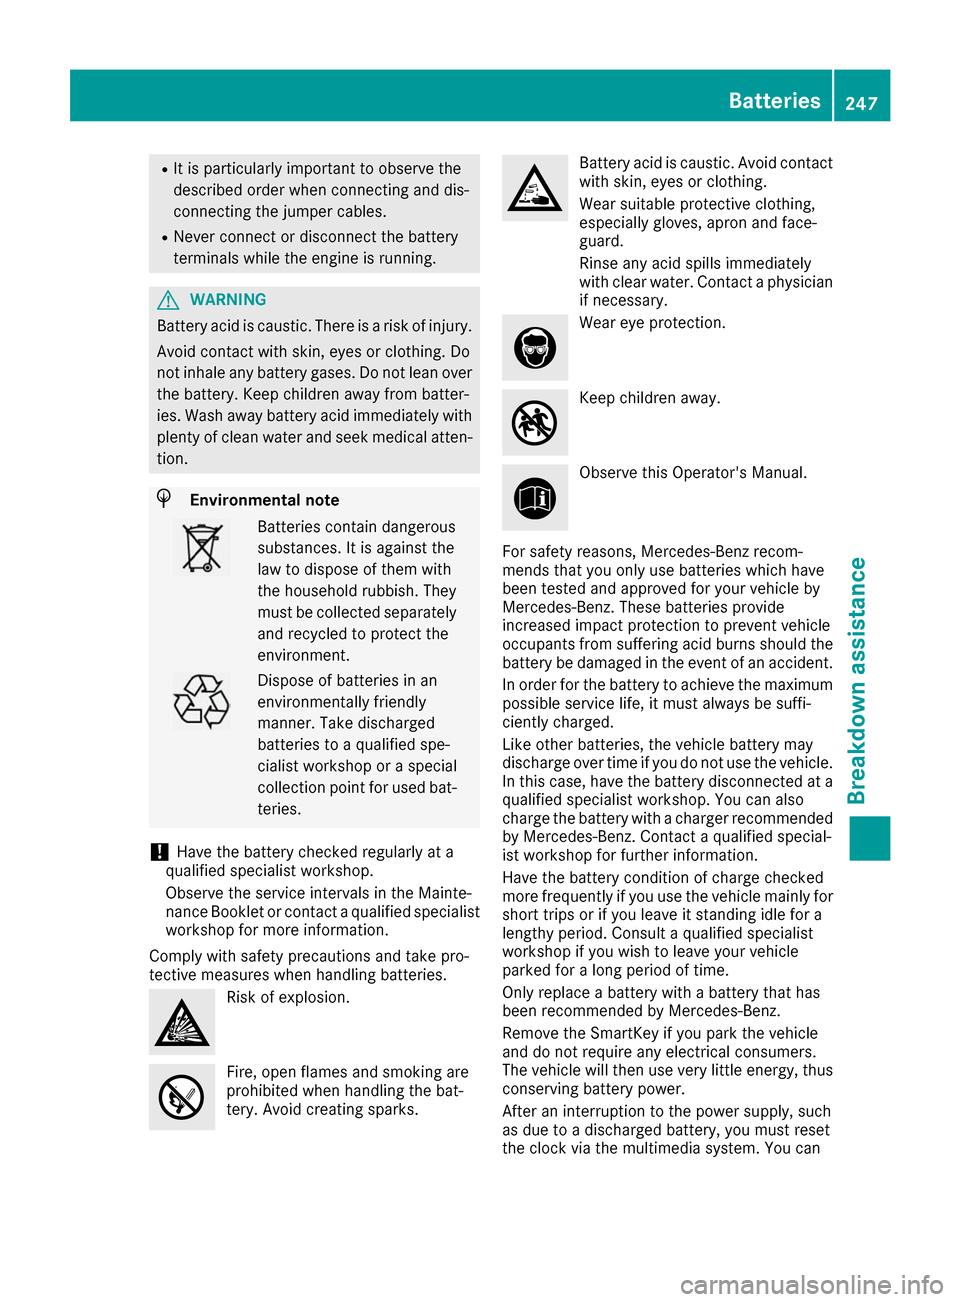 mercedes benz b class owners manual pdf